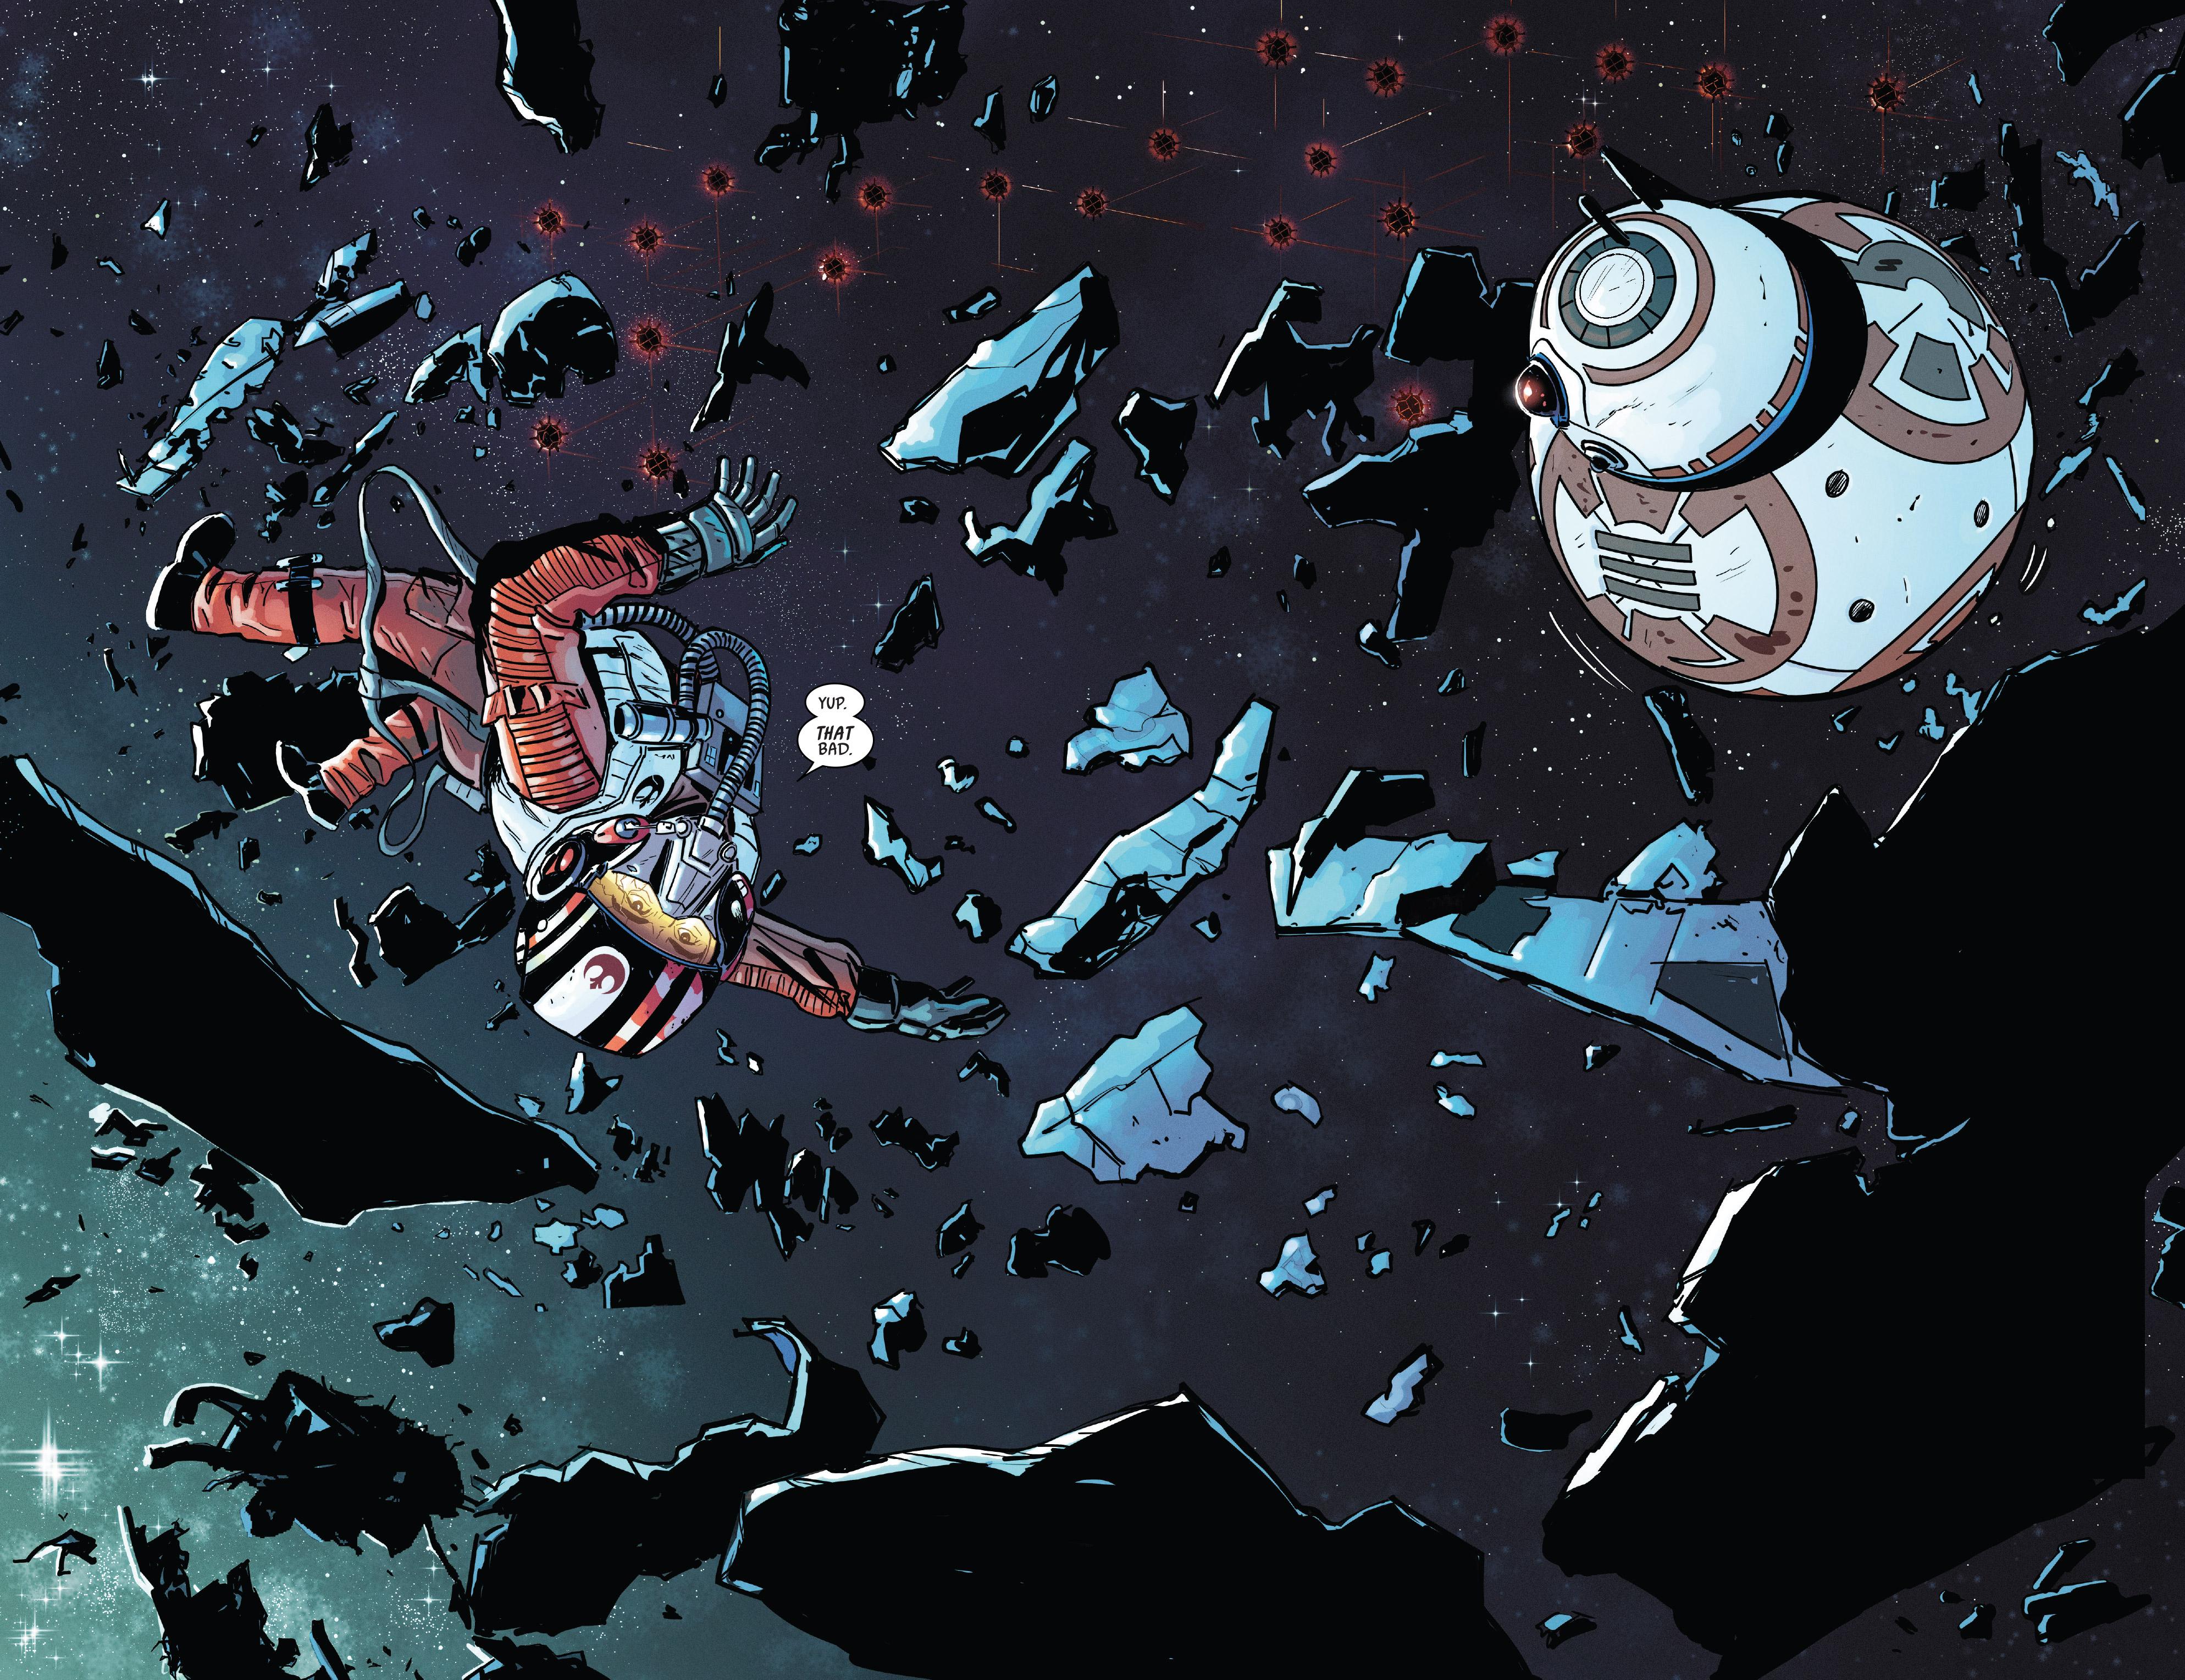 Read online Star Wars: Poe Dameron comic -  Issue # _Annual 1 - 6